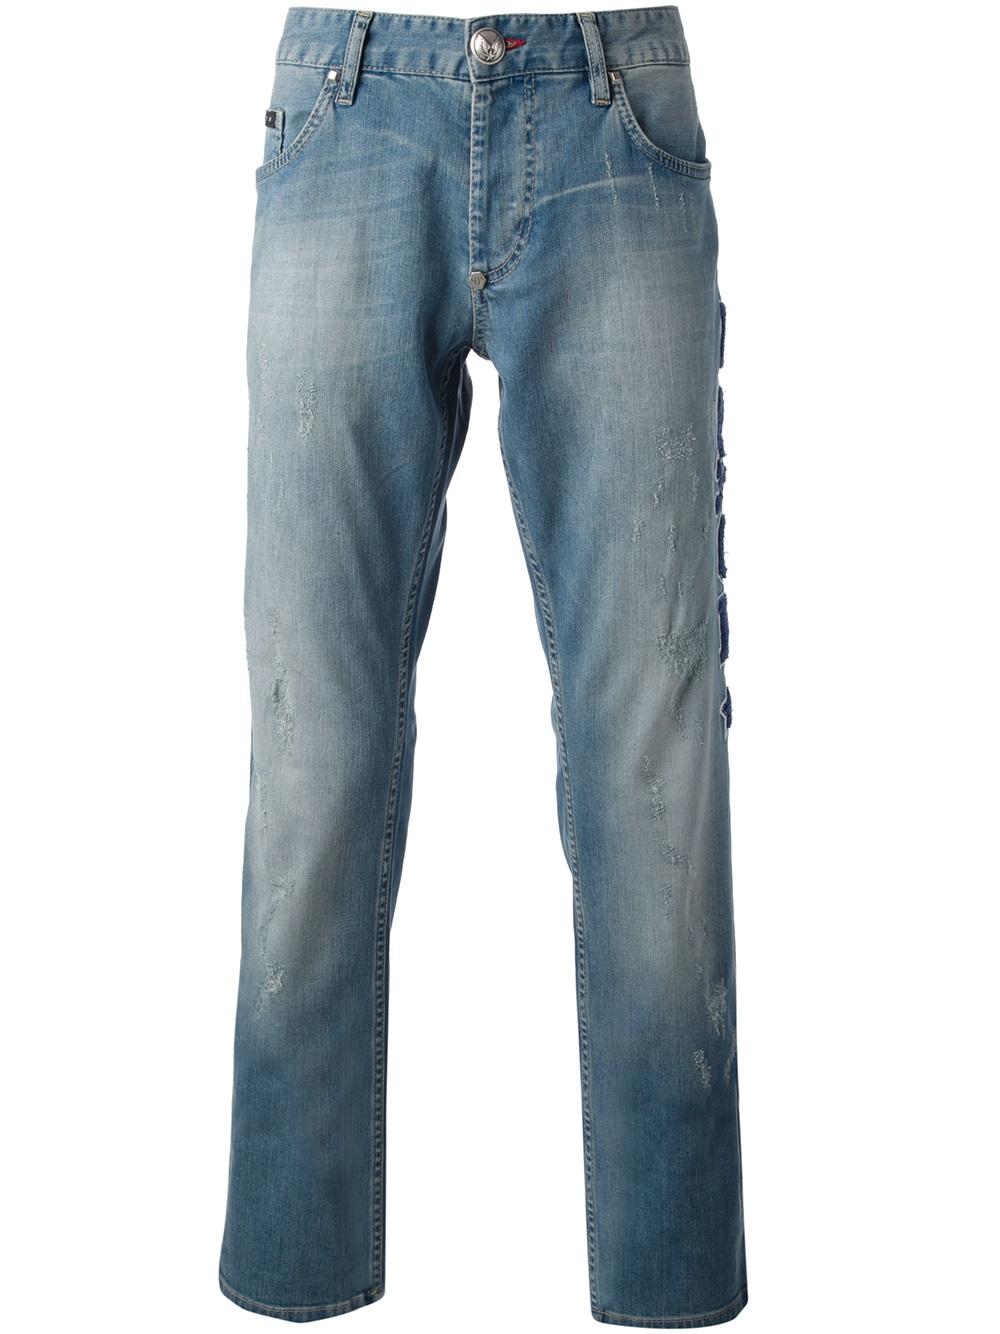 lyst philipp plein fck straight leg jeans in blue for men. Black Bedroom Furniture Sets. Home Design Ideas